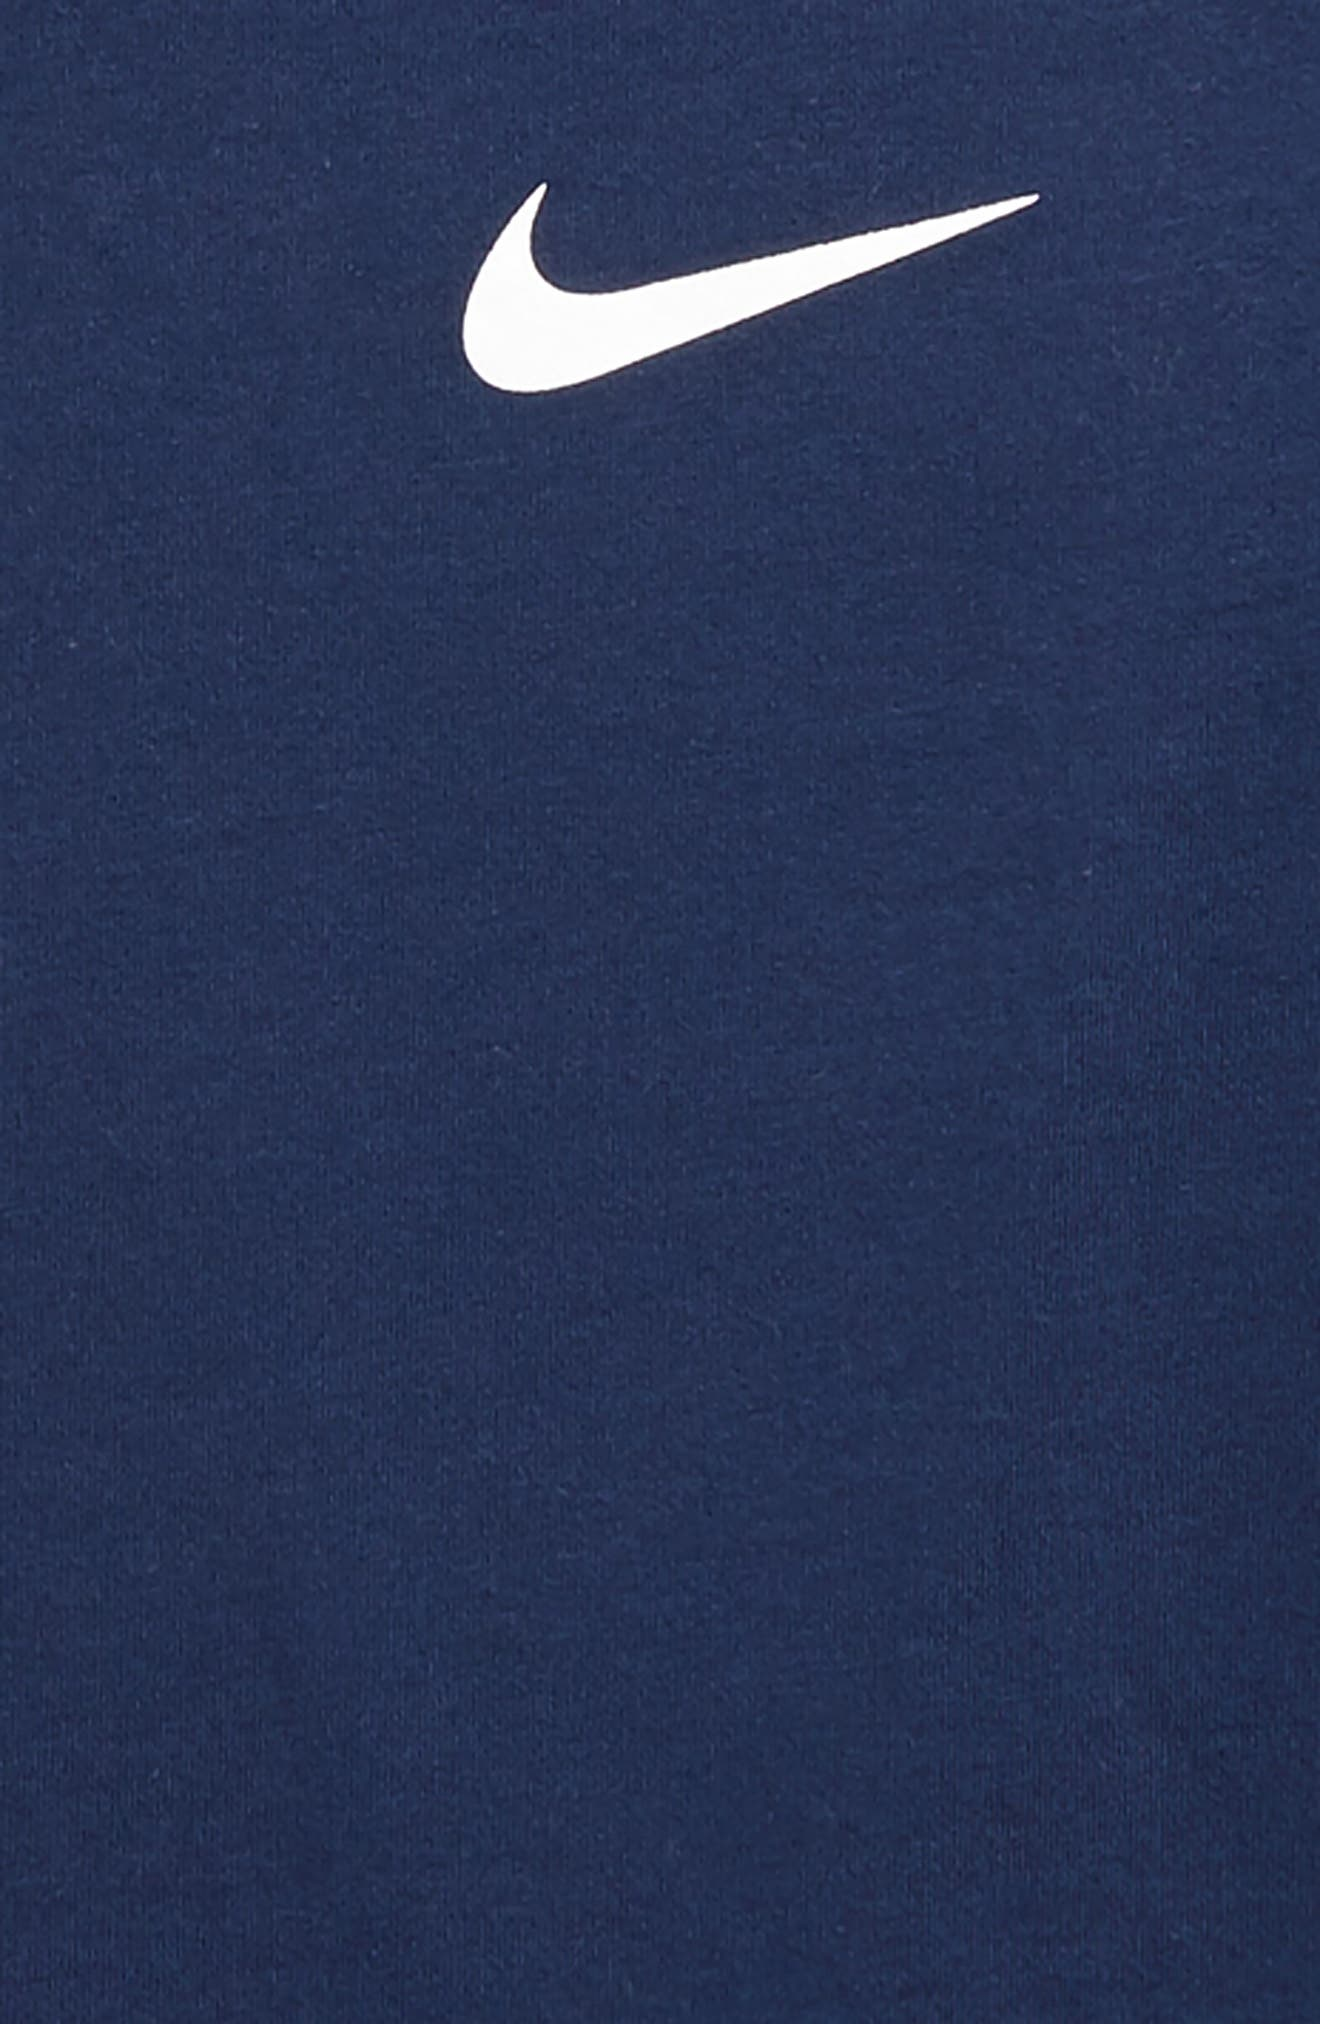 Dry Elite Long Sleeve T-Shirt,                             Alternate thumbnail 2, color,                             Midnight Navy